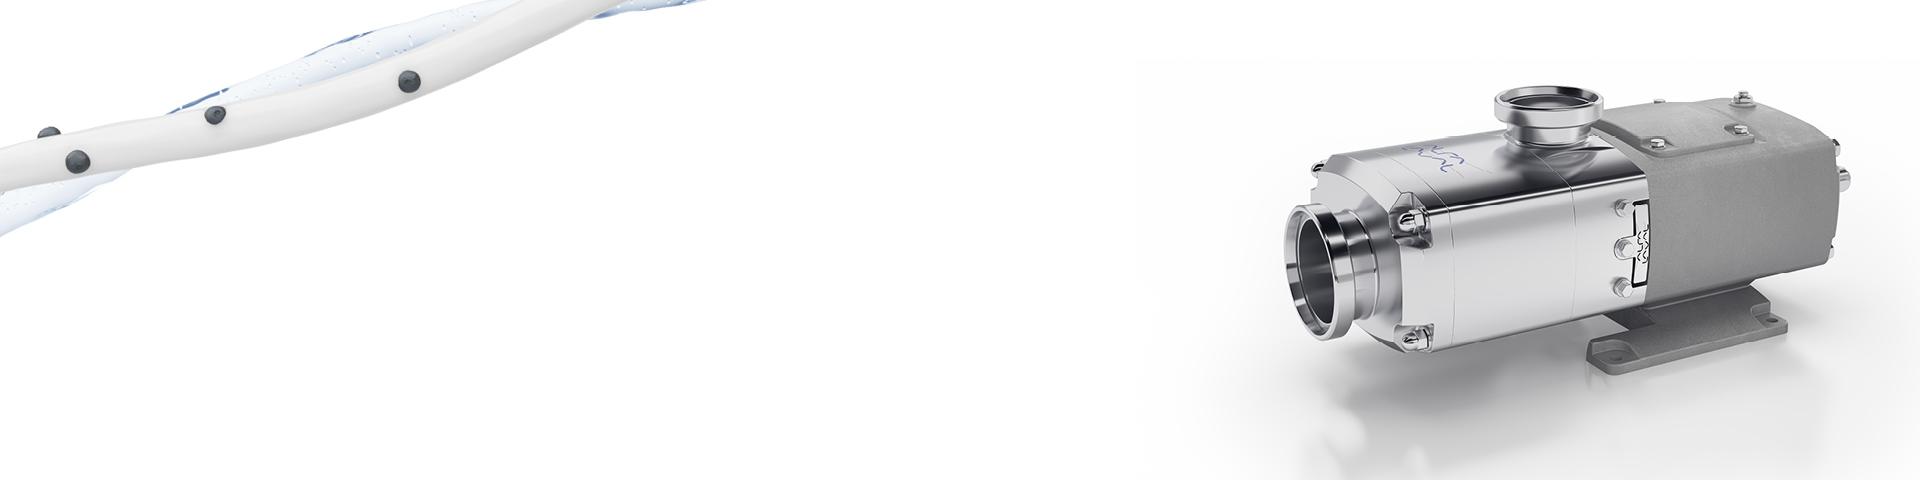 TwinScrew align center hero-banner 1920x480